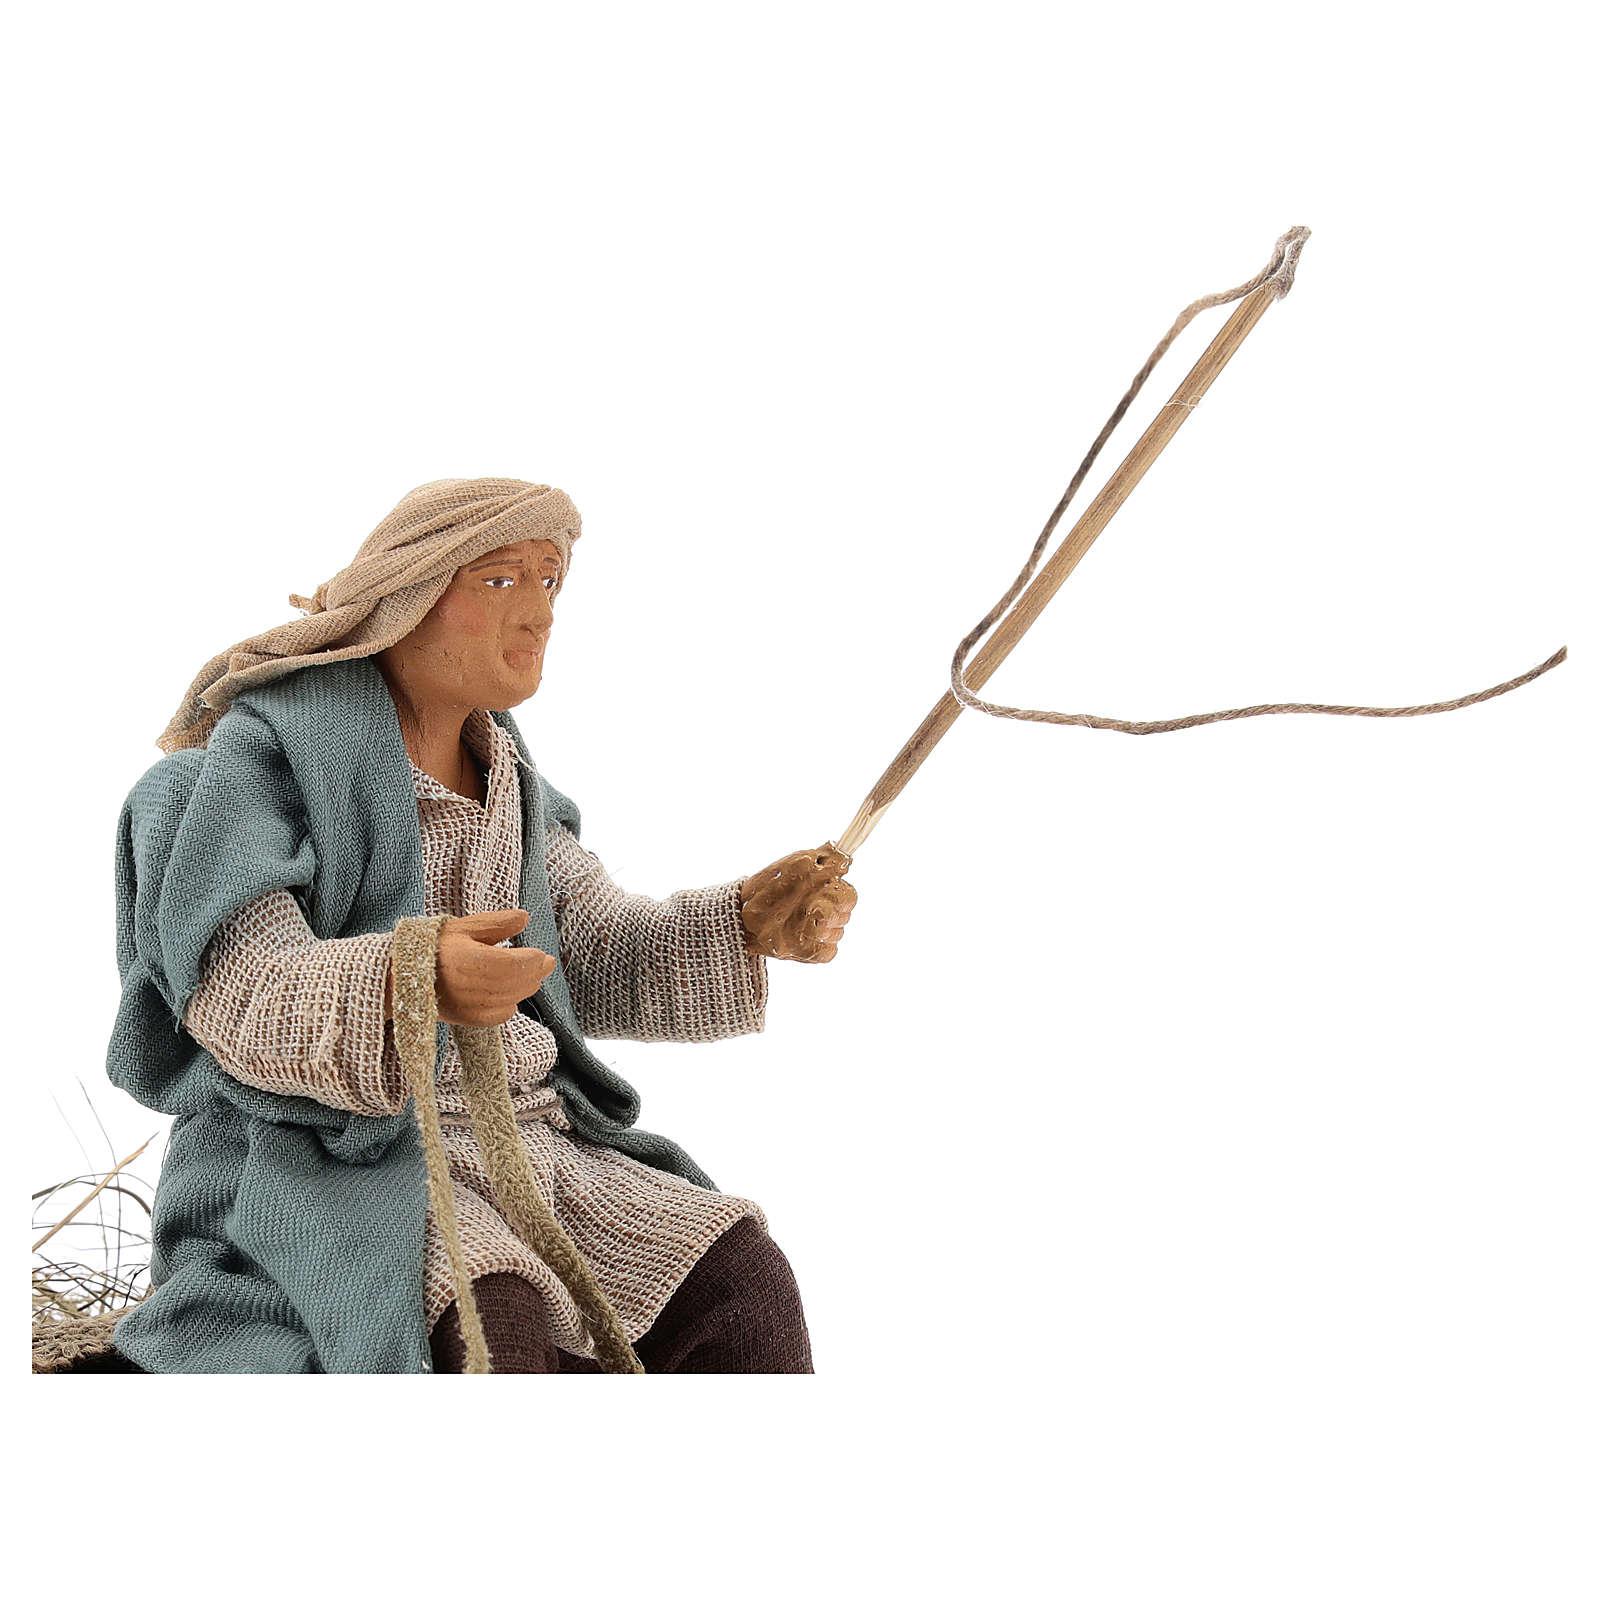 Hombre sobre de una carreta movimiento terracota 14 cm 4